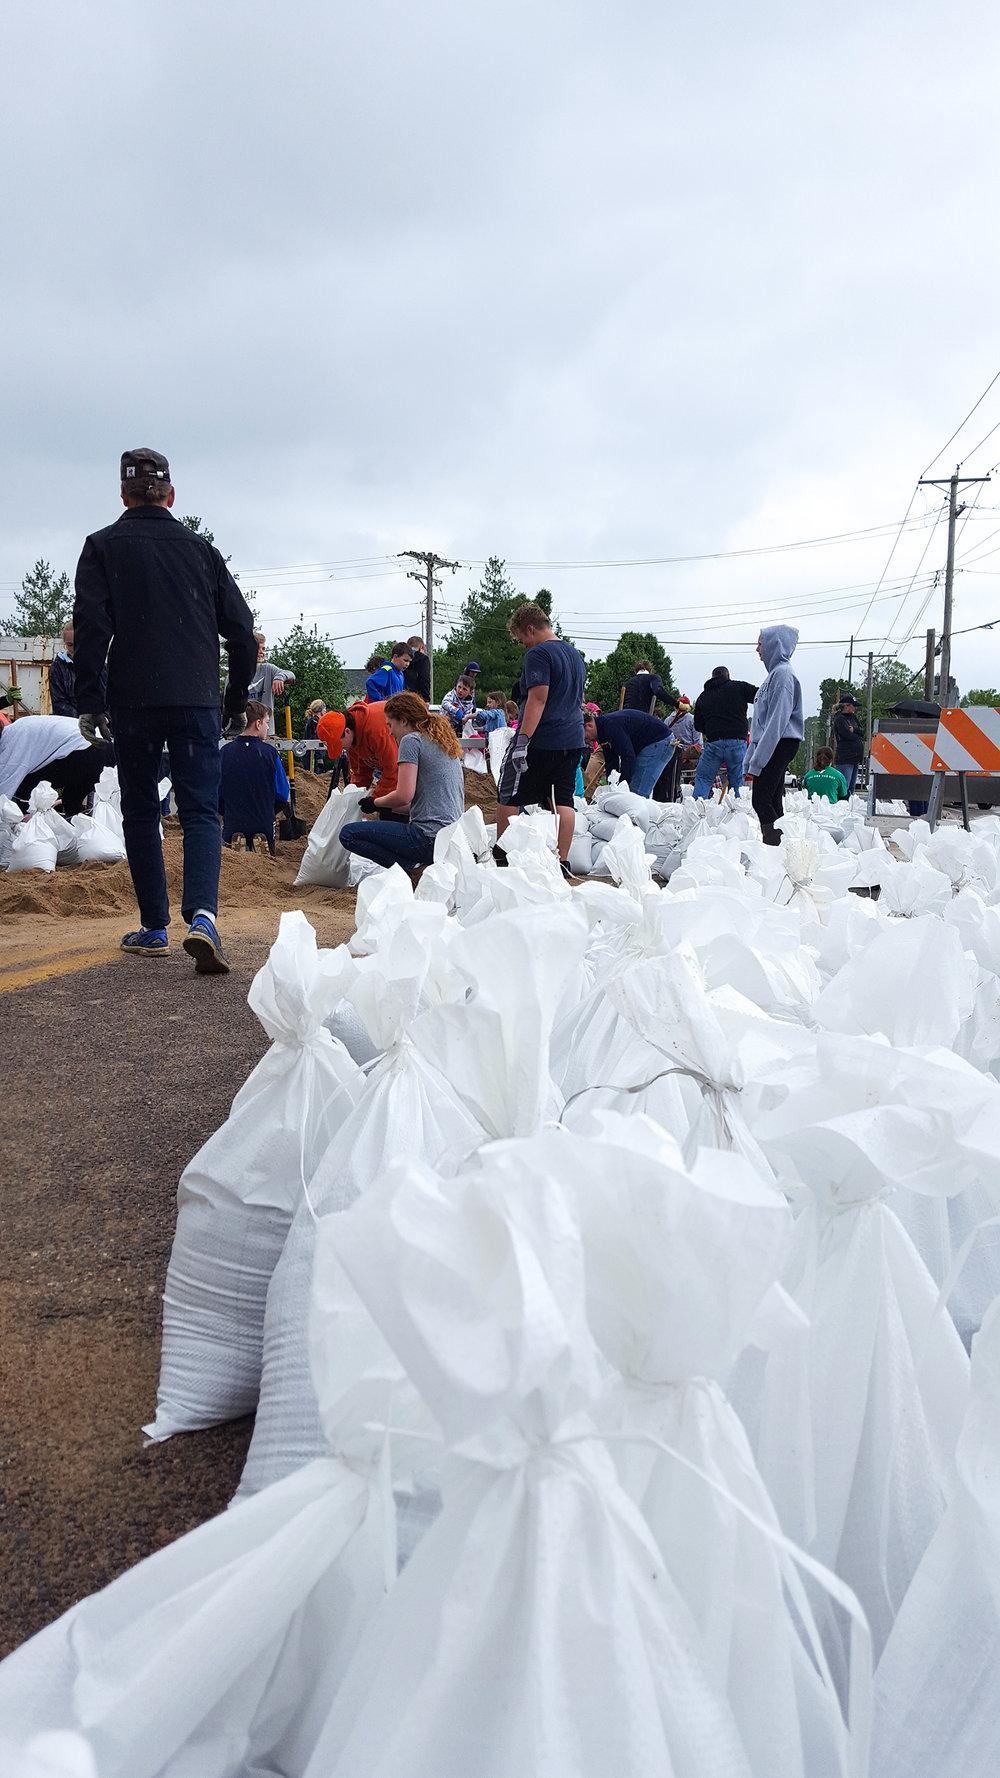 Valley Park, MO Sandbagging Efforts in May